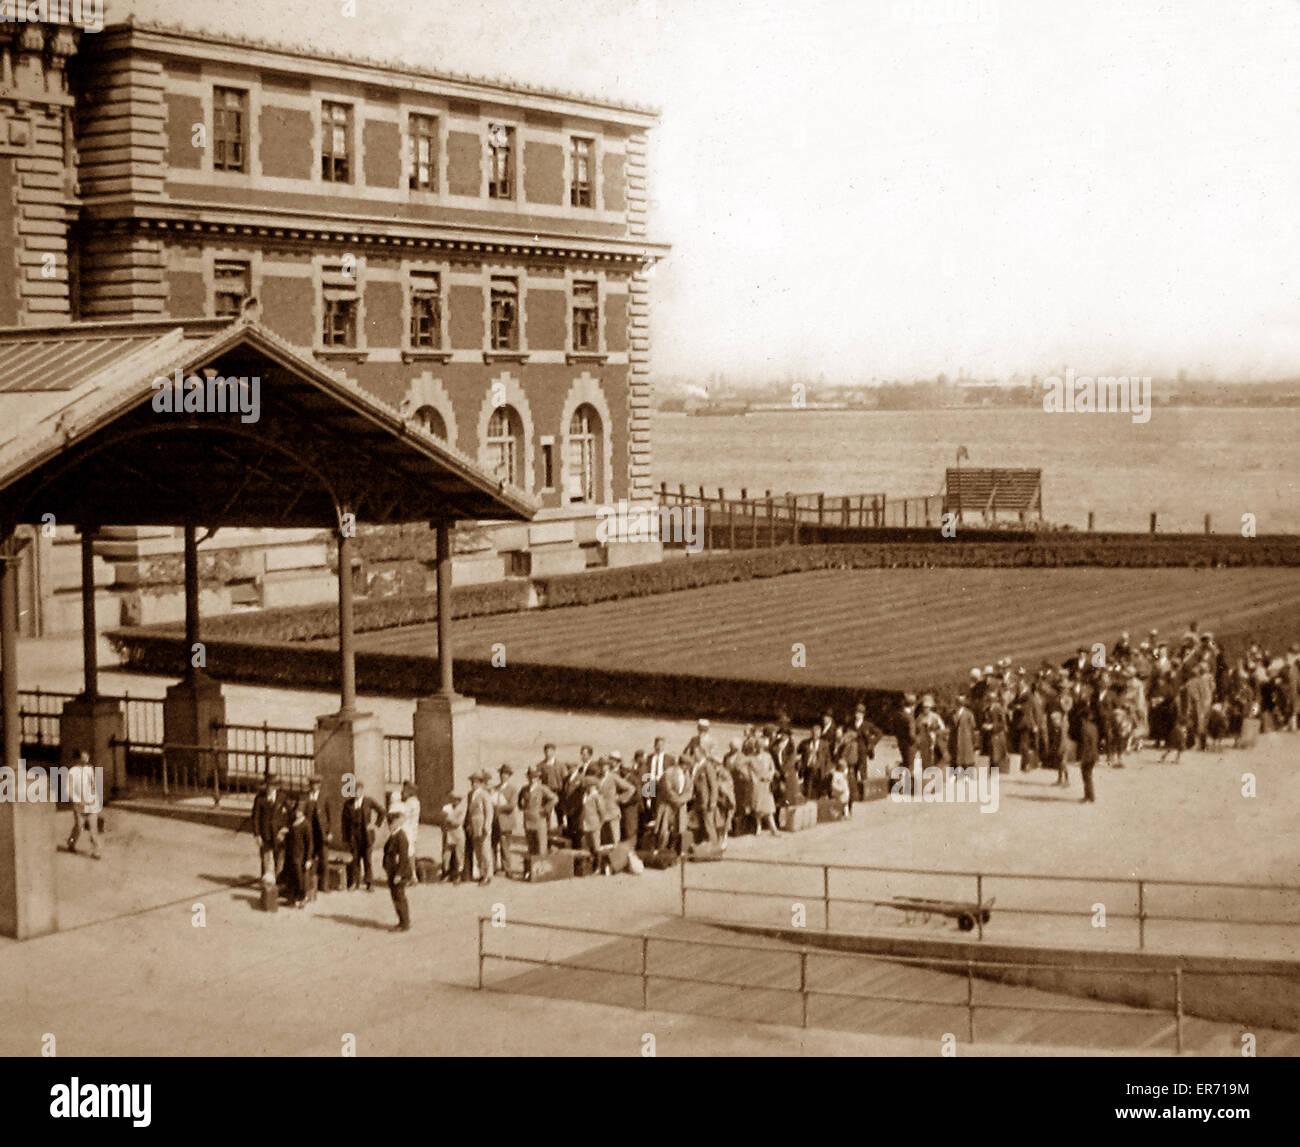 Immigrants Arriving At Ellis Island New York Pre